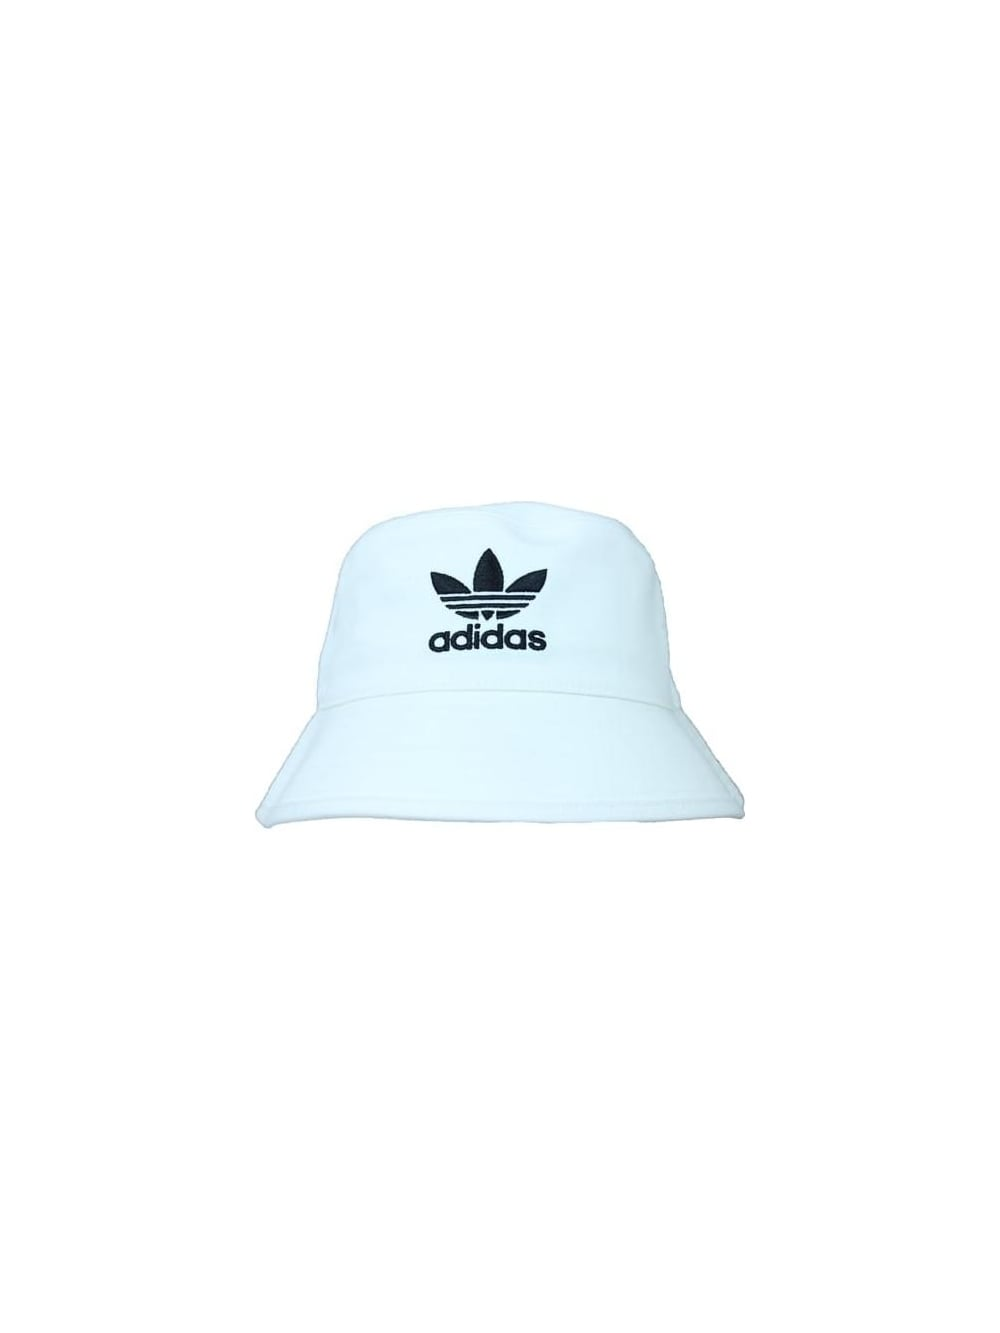 adidas Originals AC Bucket Hat in White - Northern Threads 3354595e8e9